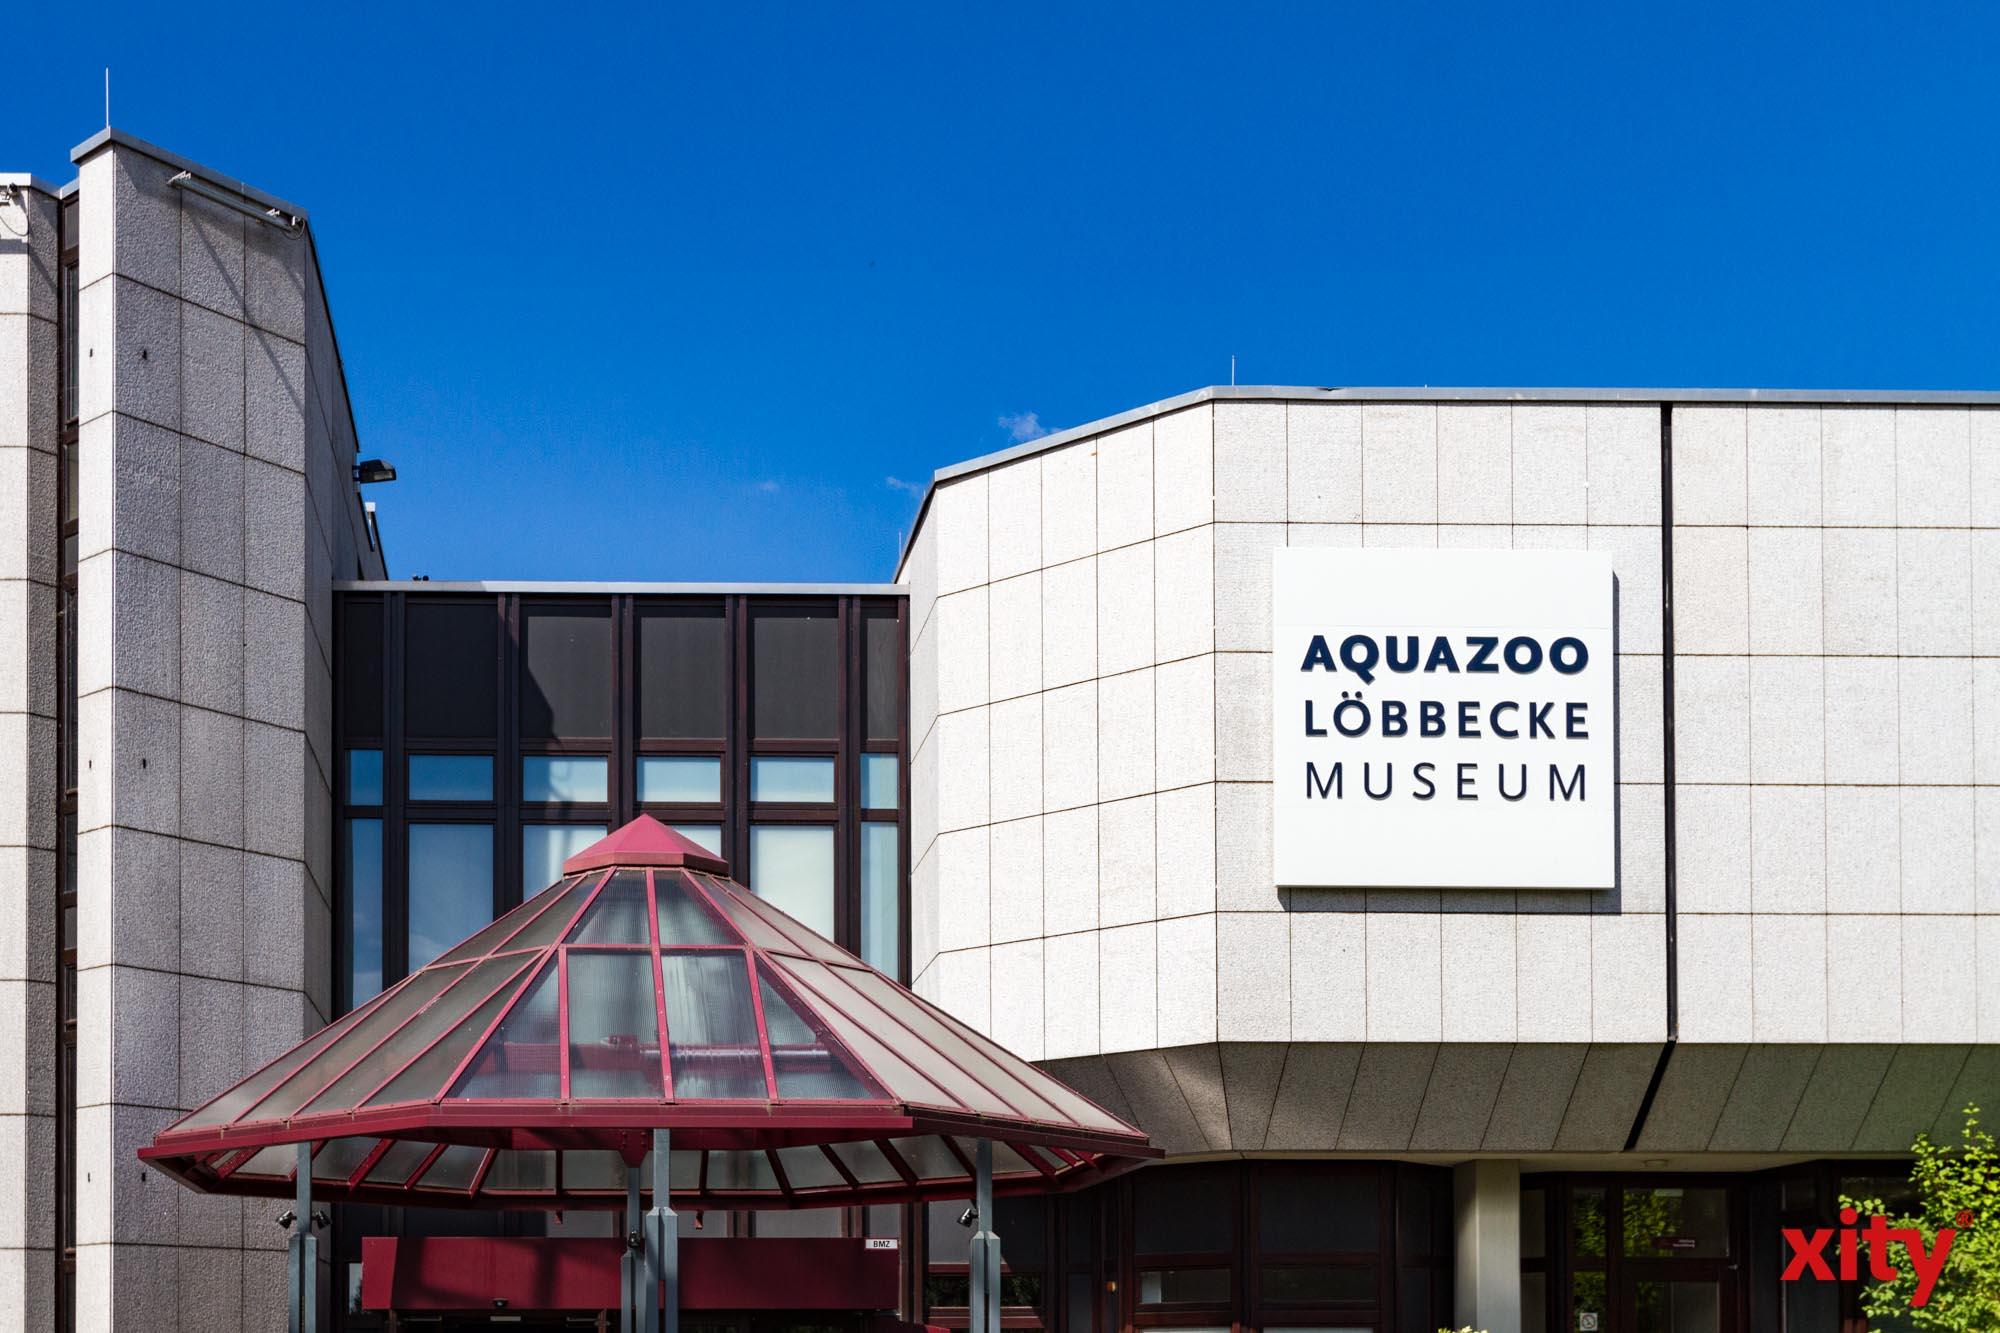 Tropenhalle im Aquazoo bleibt vorerst geschlossen (Foto: xity)